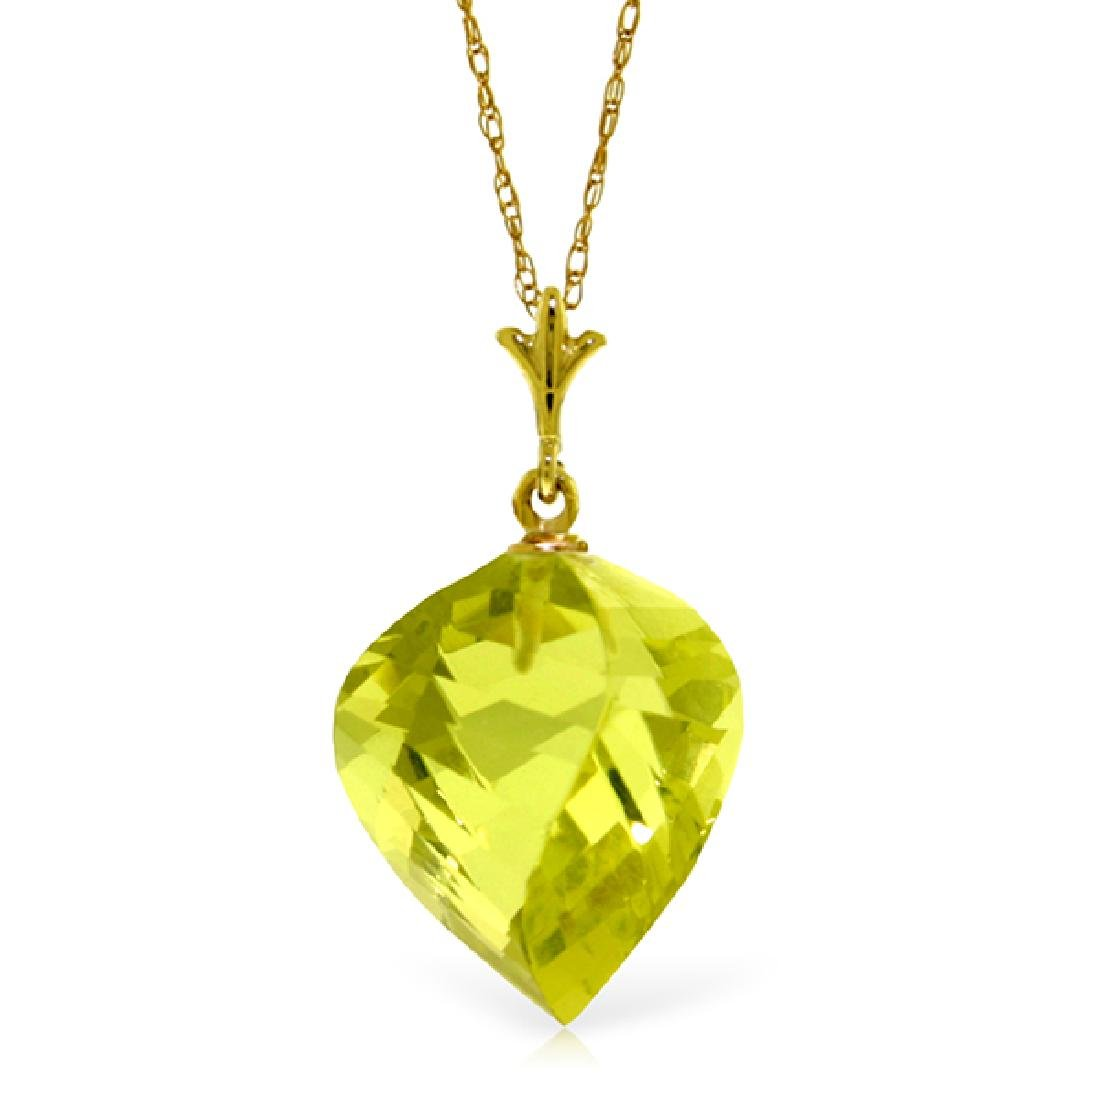 Genuine 10.75 ctw Quartz Lemon Necklace Jewelry 14KT